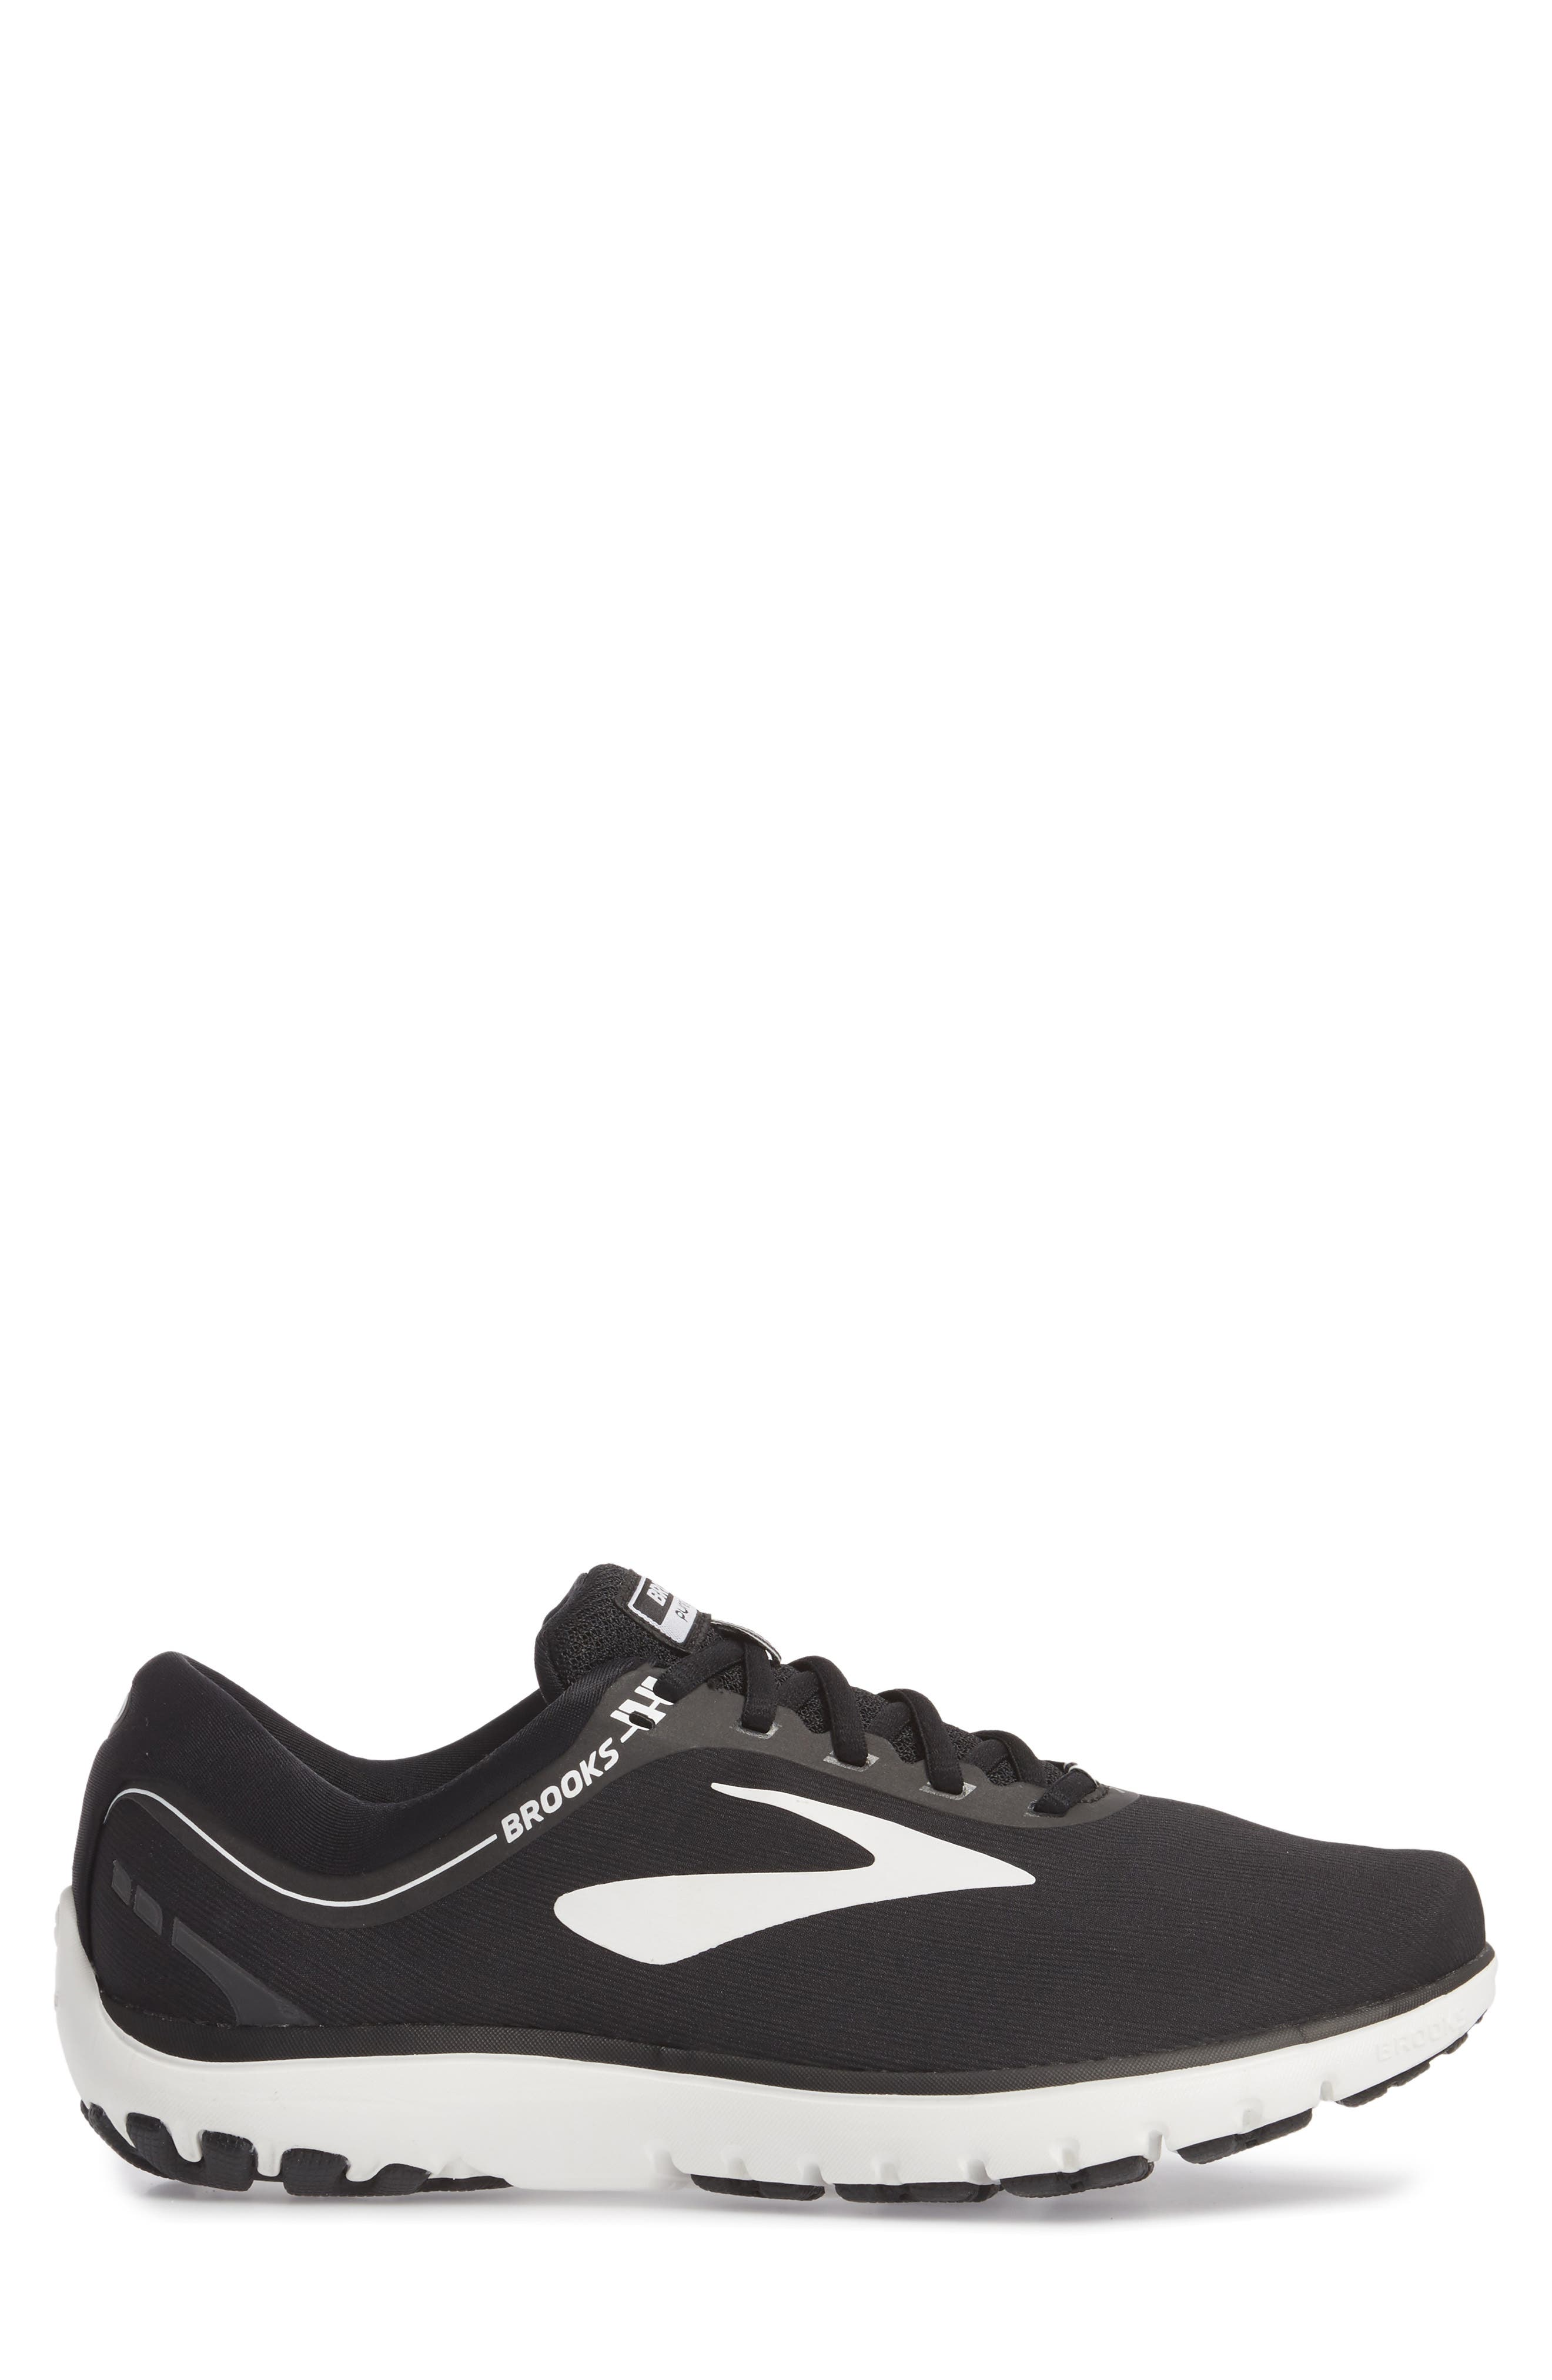 PureFlow 7 Running Shoe,                             Alternate thumbnail 3, color,                             Black/ White